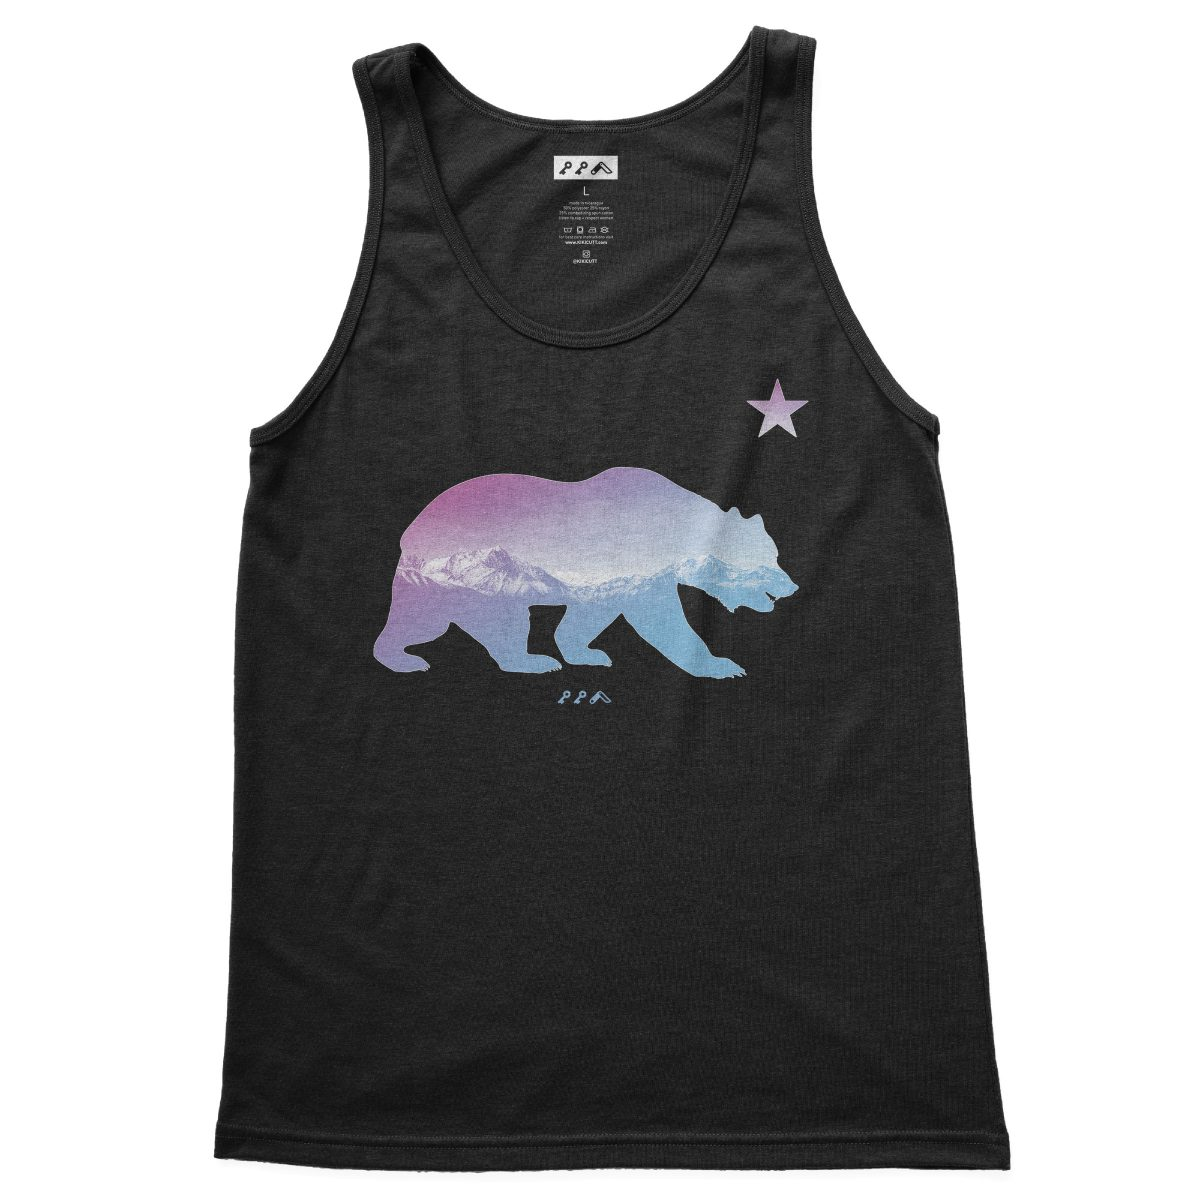 """BARE MOUNTAINS"" california bear tank tops in black by kikicutt"